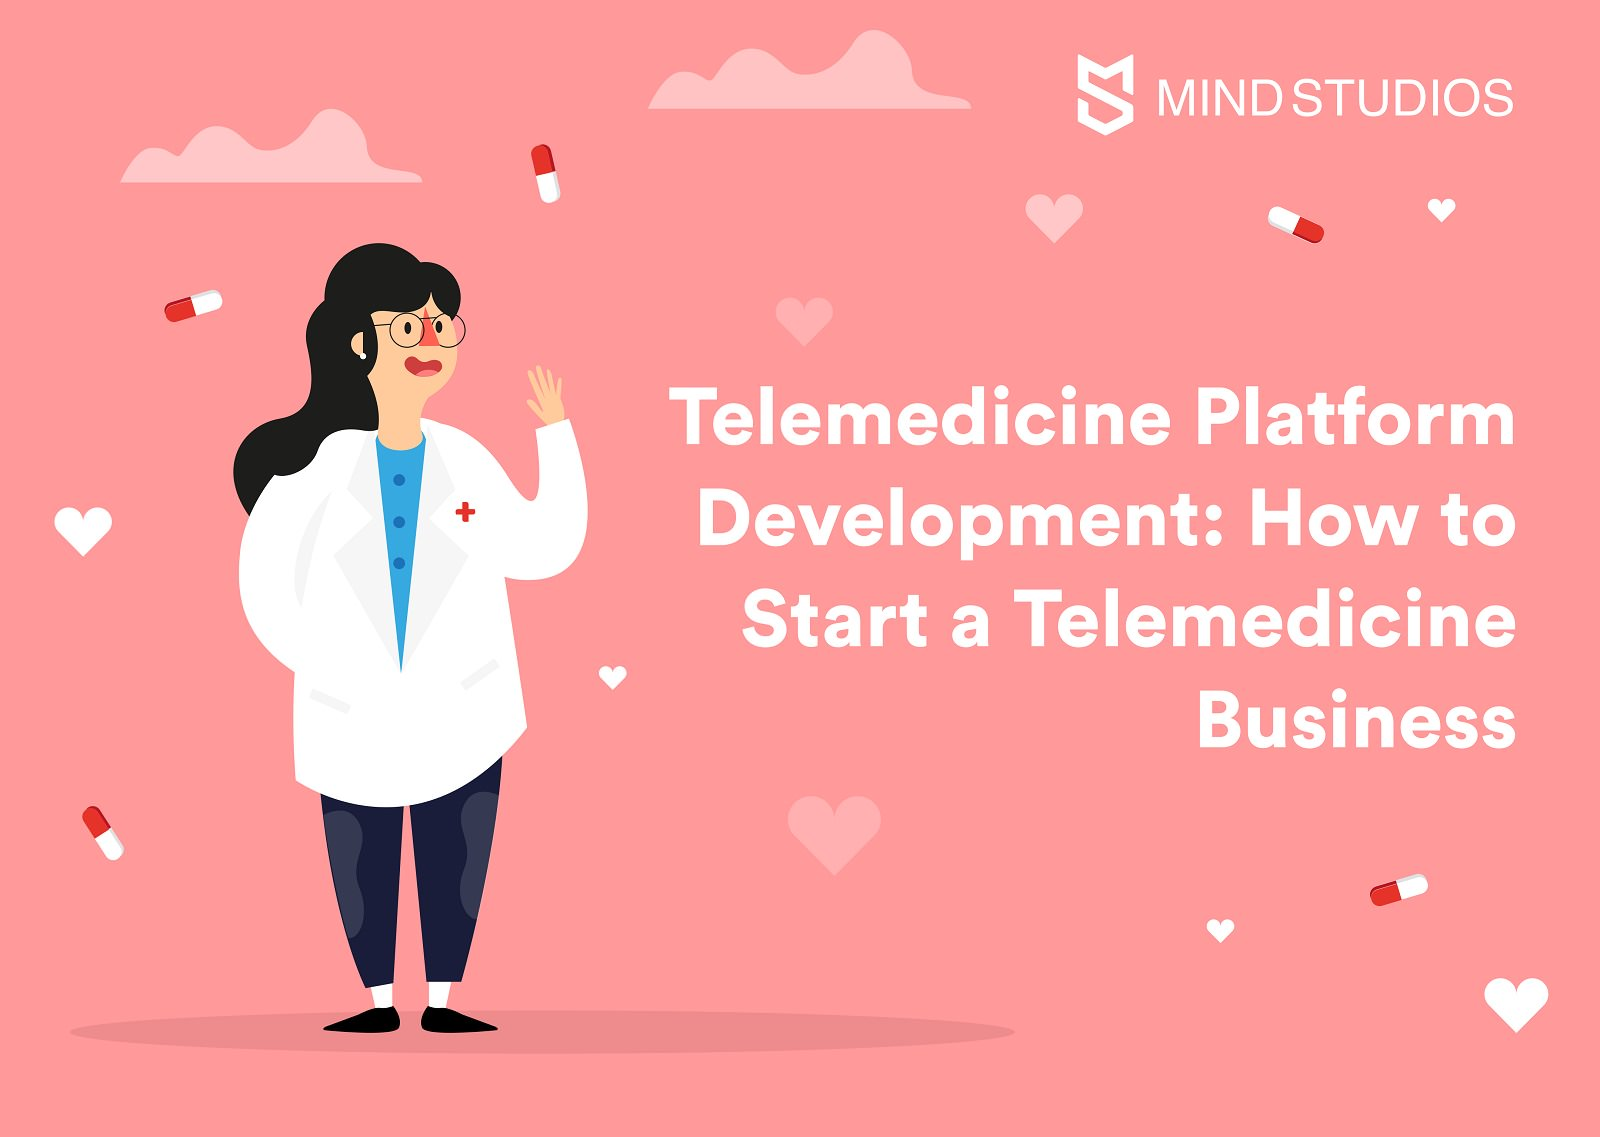 Telemedicine App Development: How to Start a Telemedicine Business